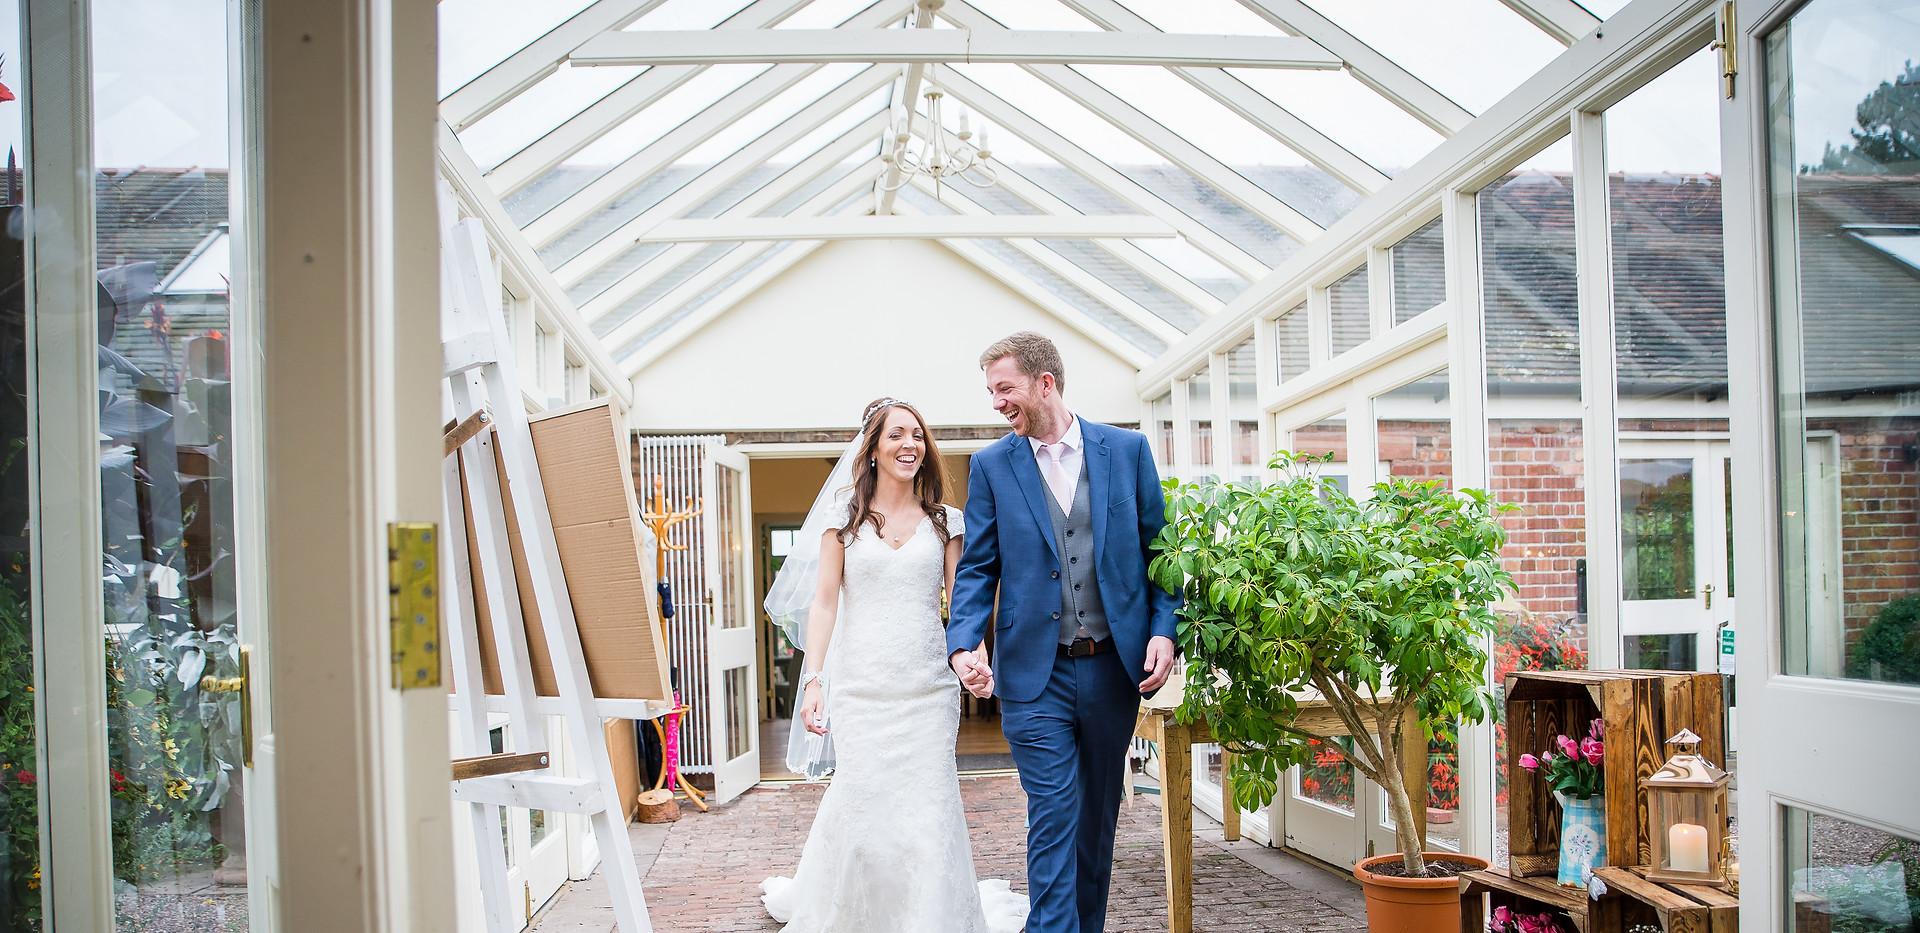 Abbeywood Wedding Photographer_8.jpg